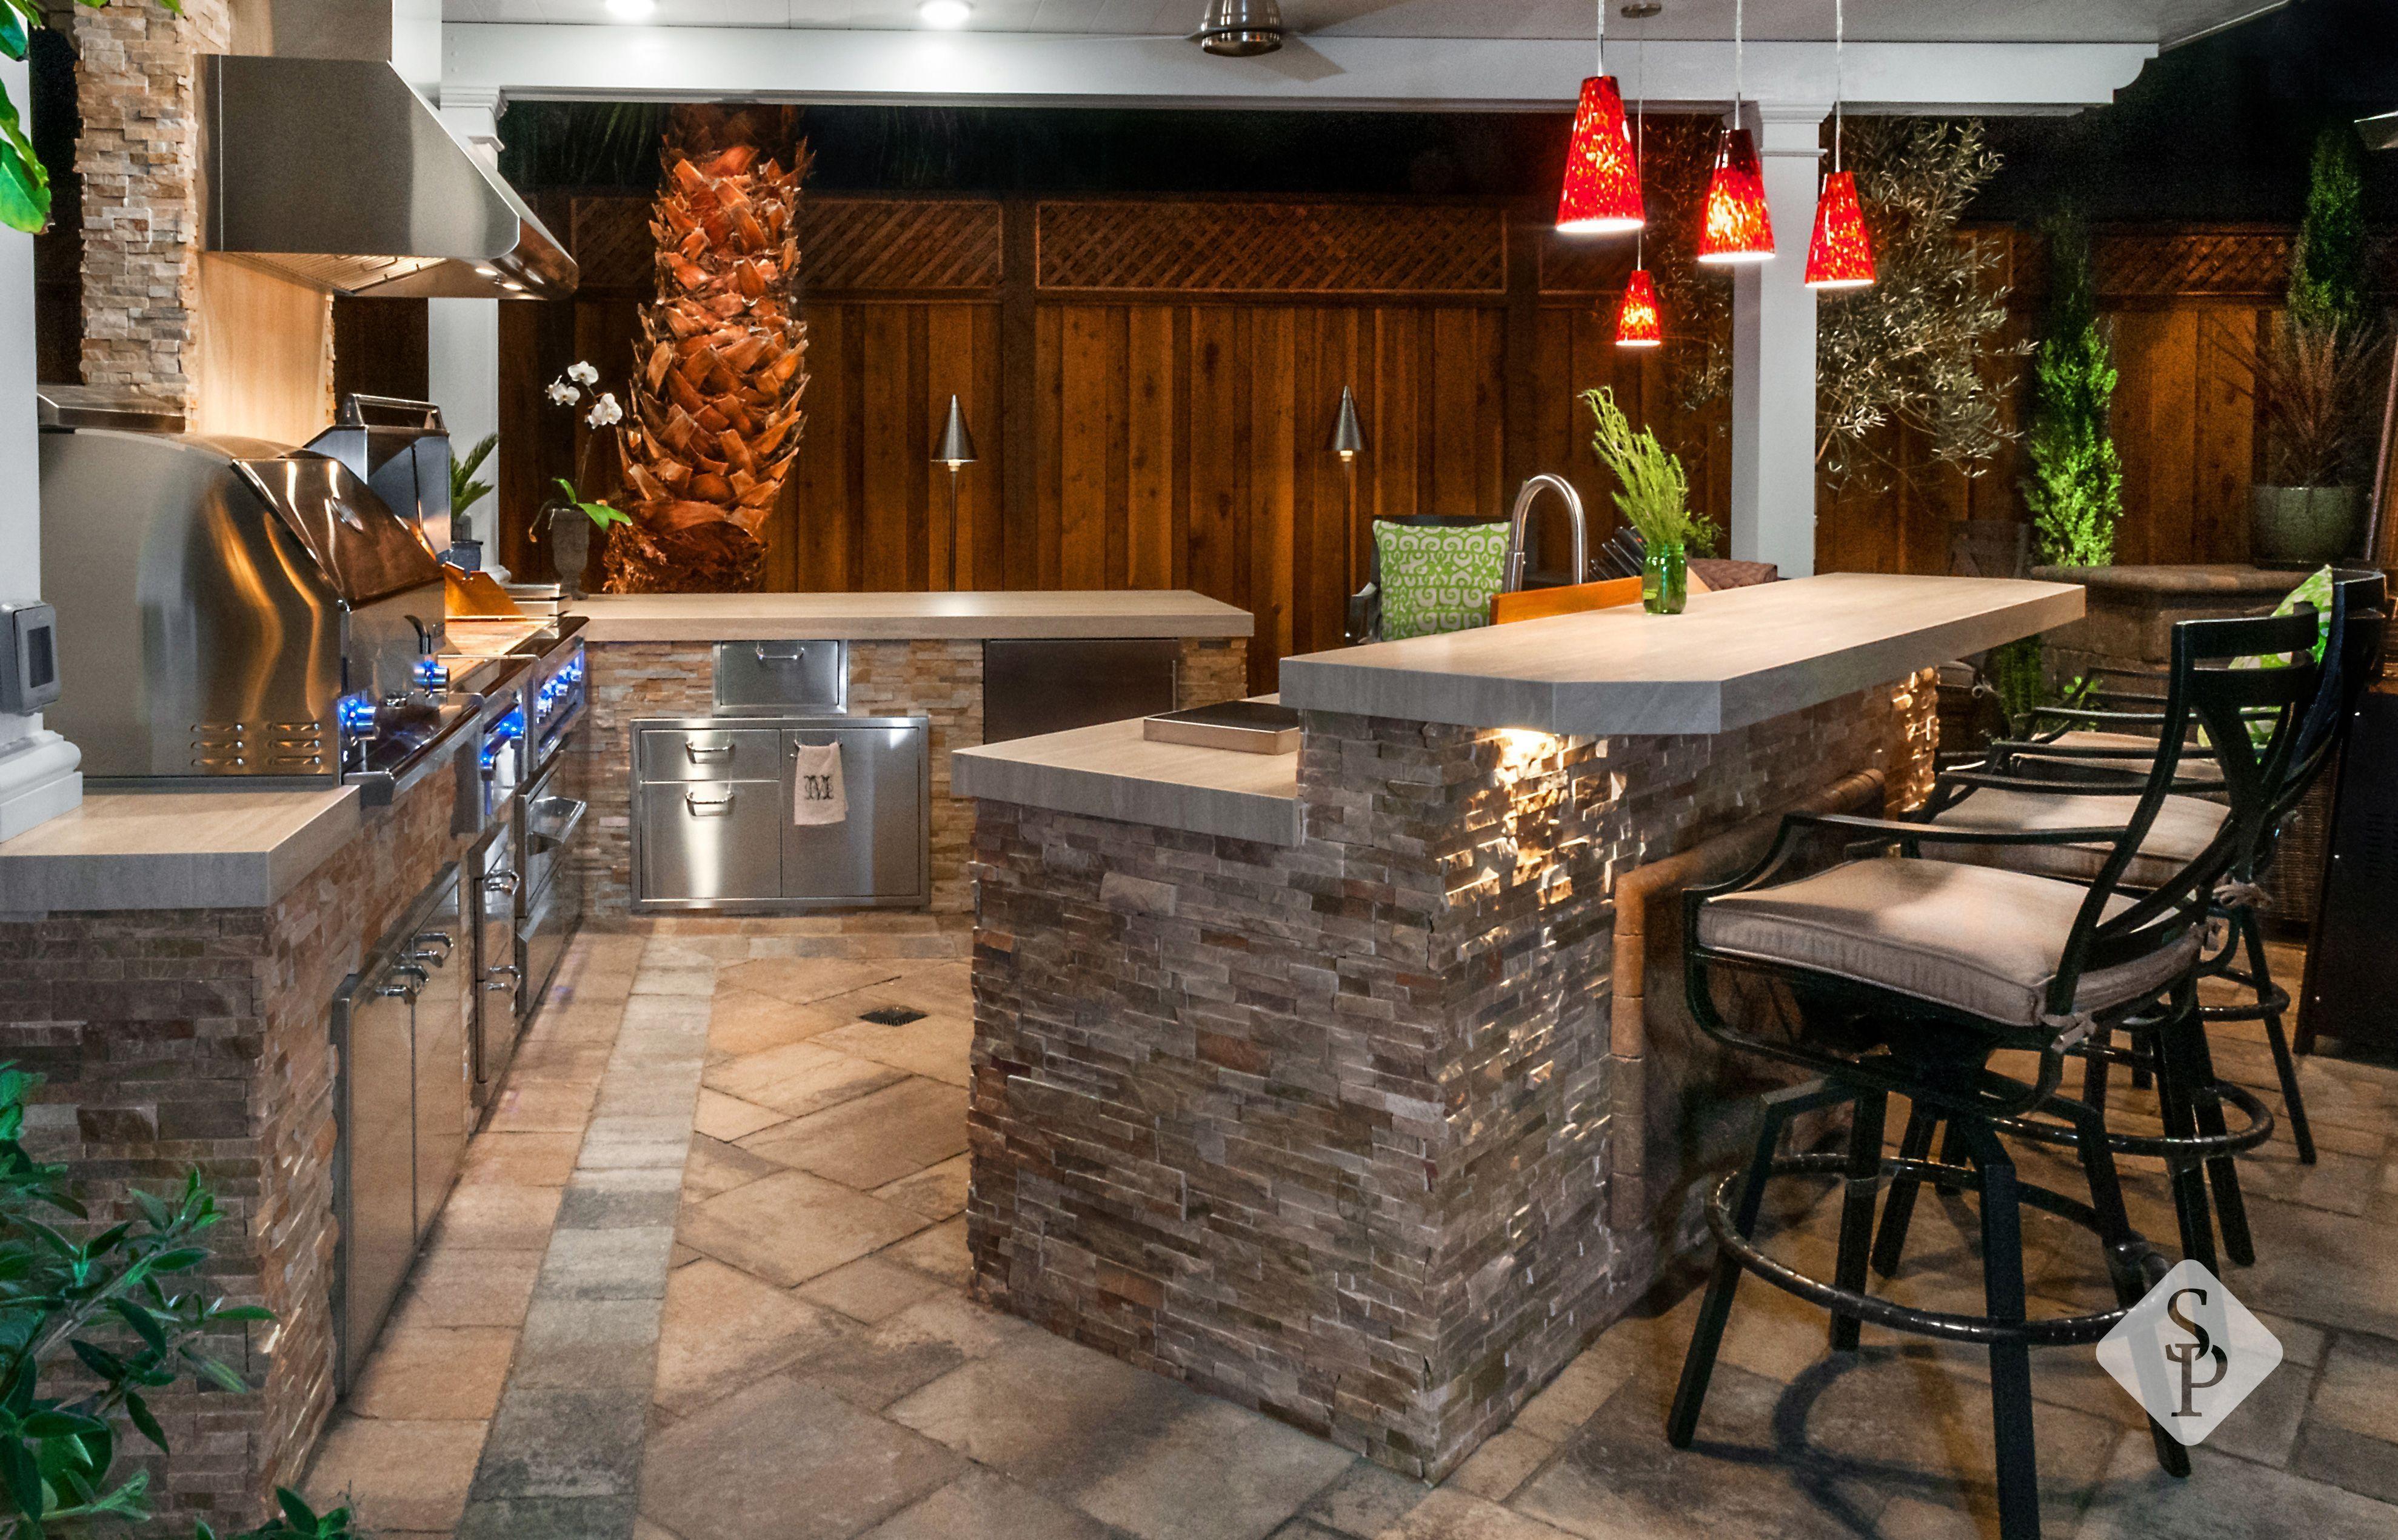 34 Cozy Fireplace Outdoor Ideas with Bar Decor | Backyard ...